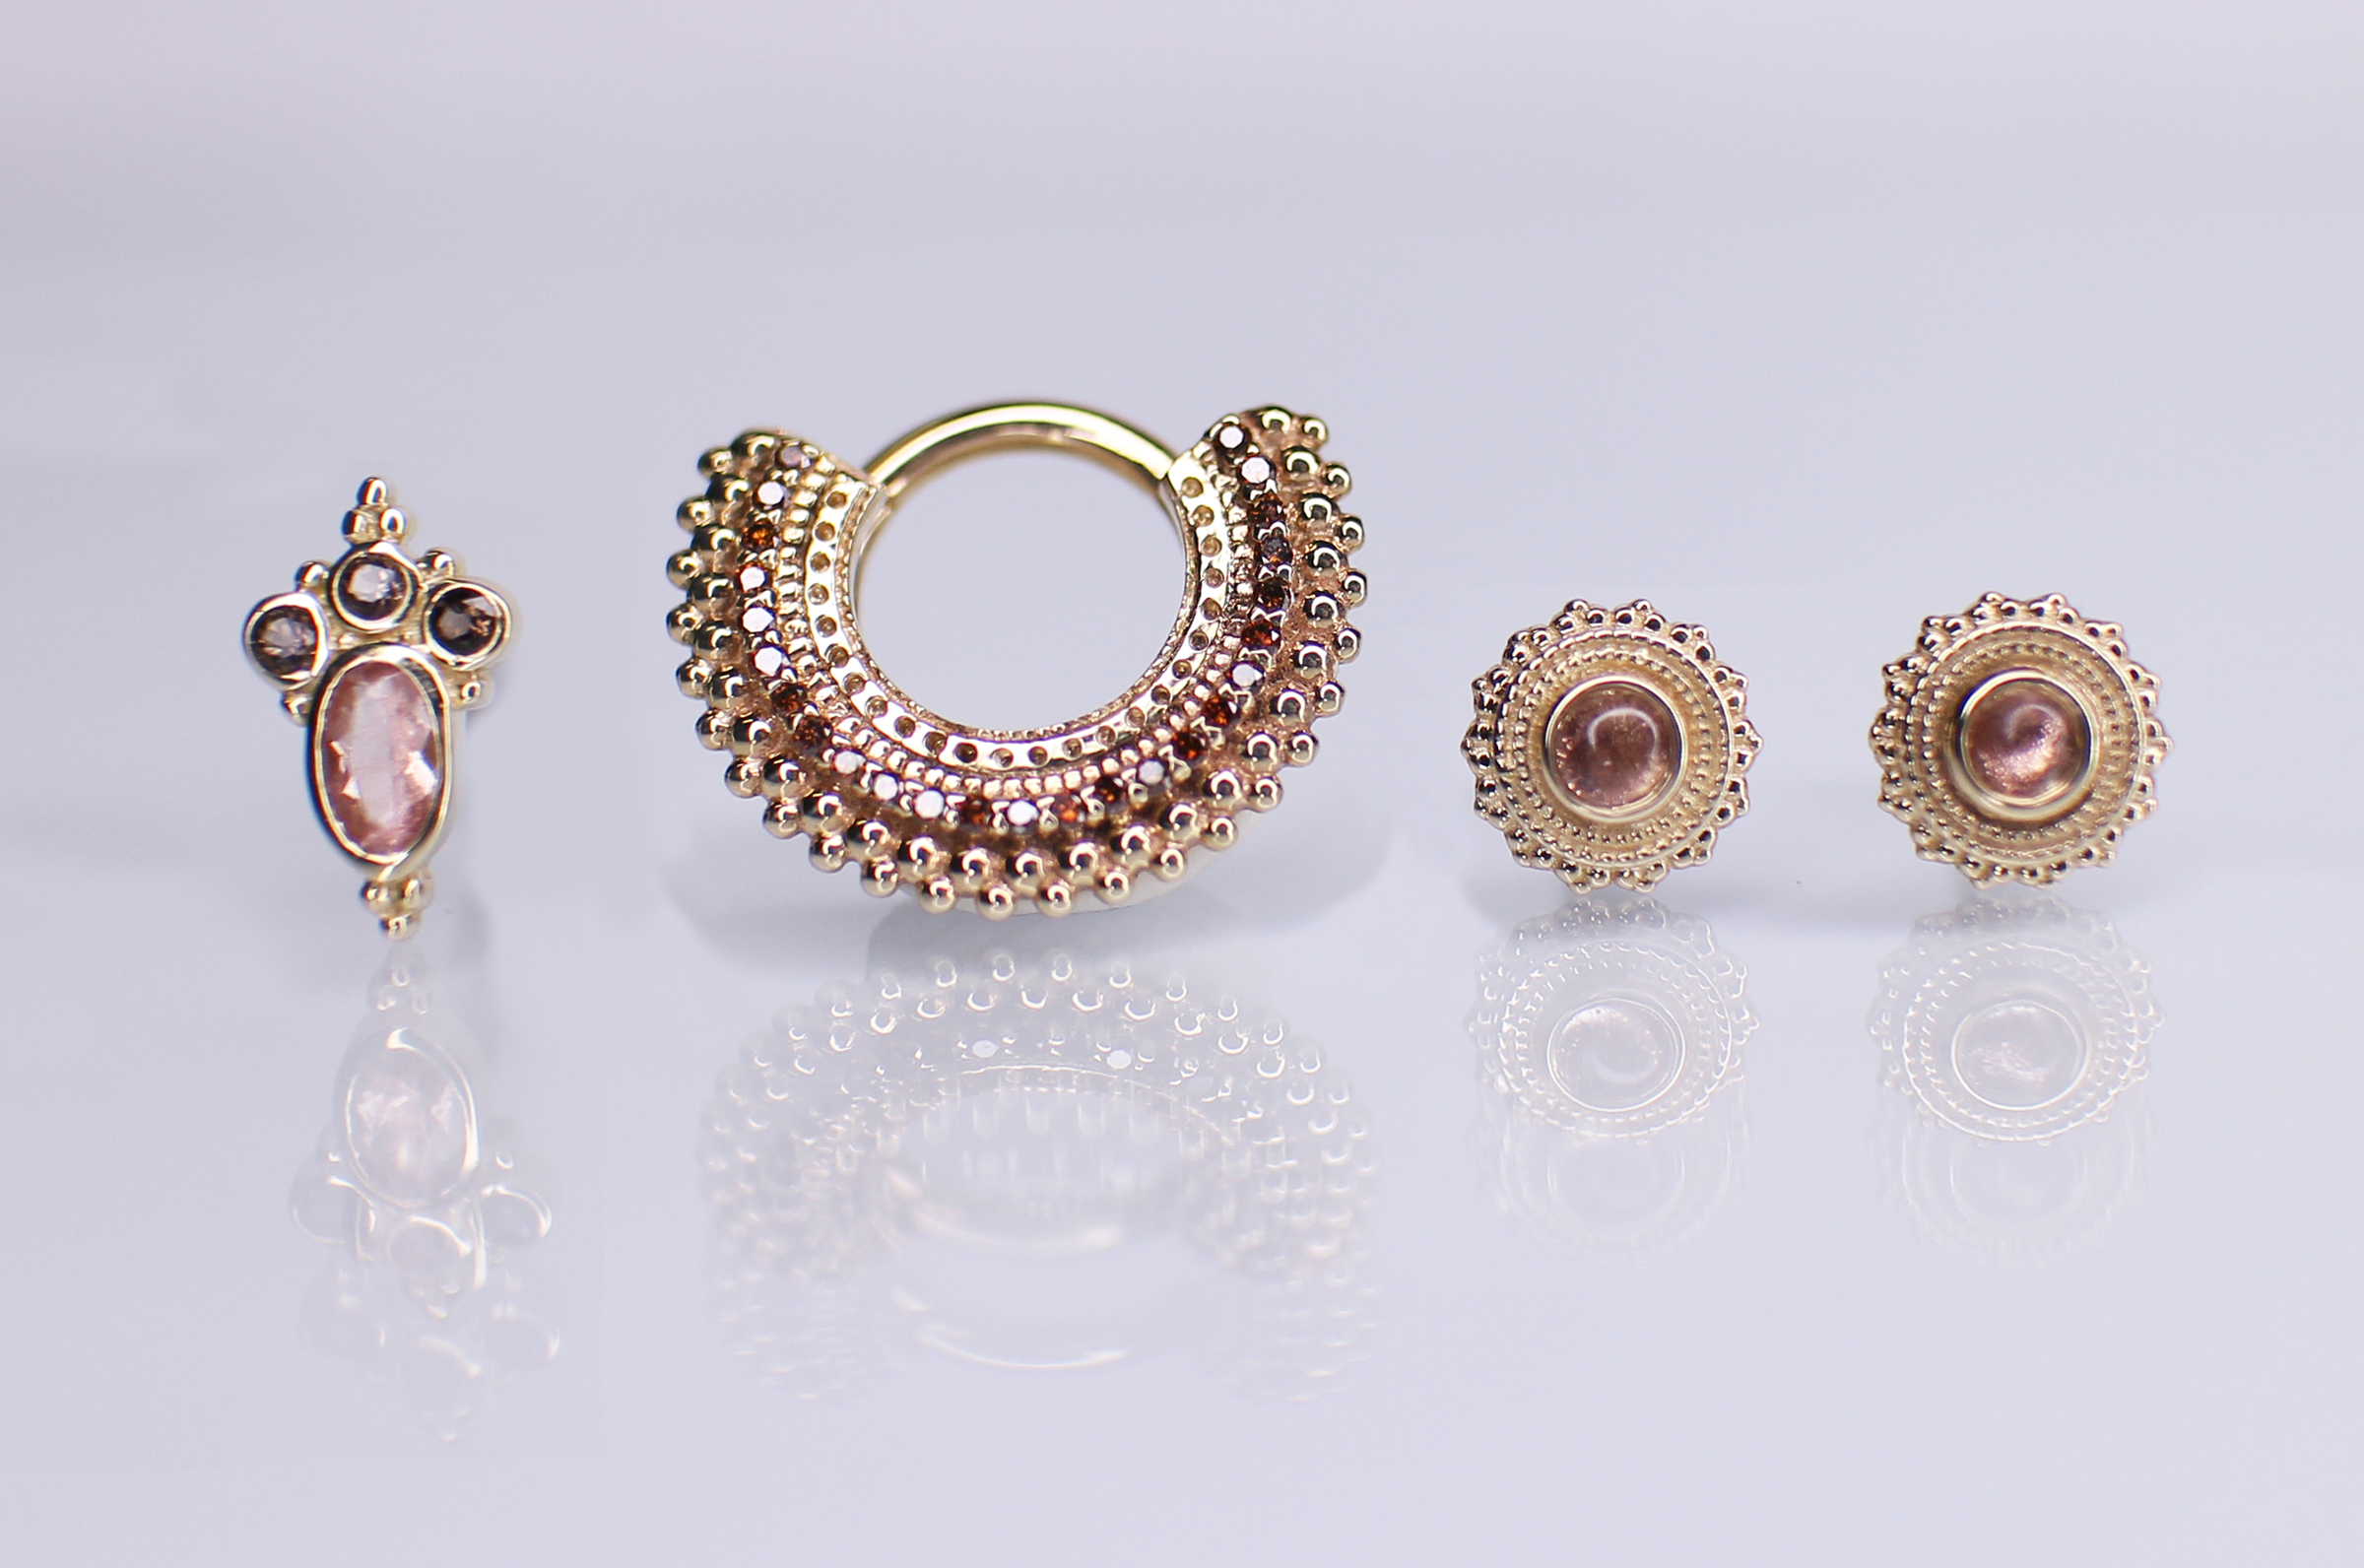 Jewelry IMG_9317 BVLA YG Sarai Sunstone Affinity Afghan.jpg